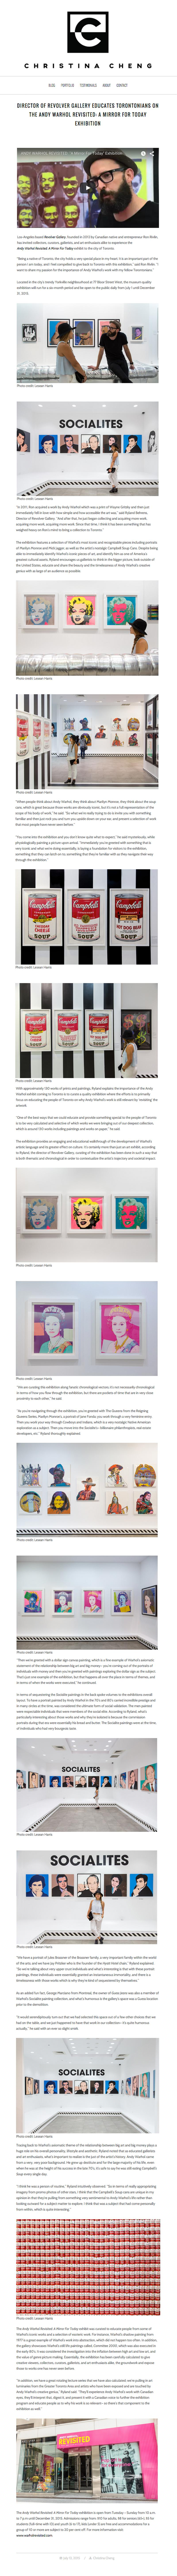 Christina Cheng Andy Warhol